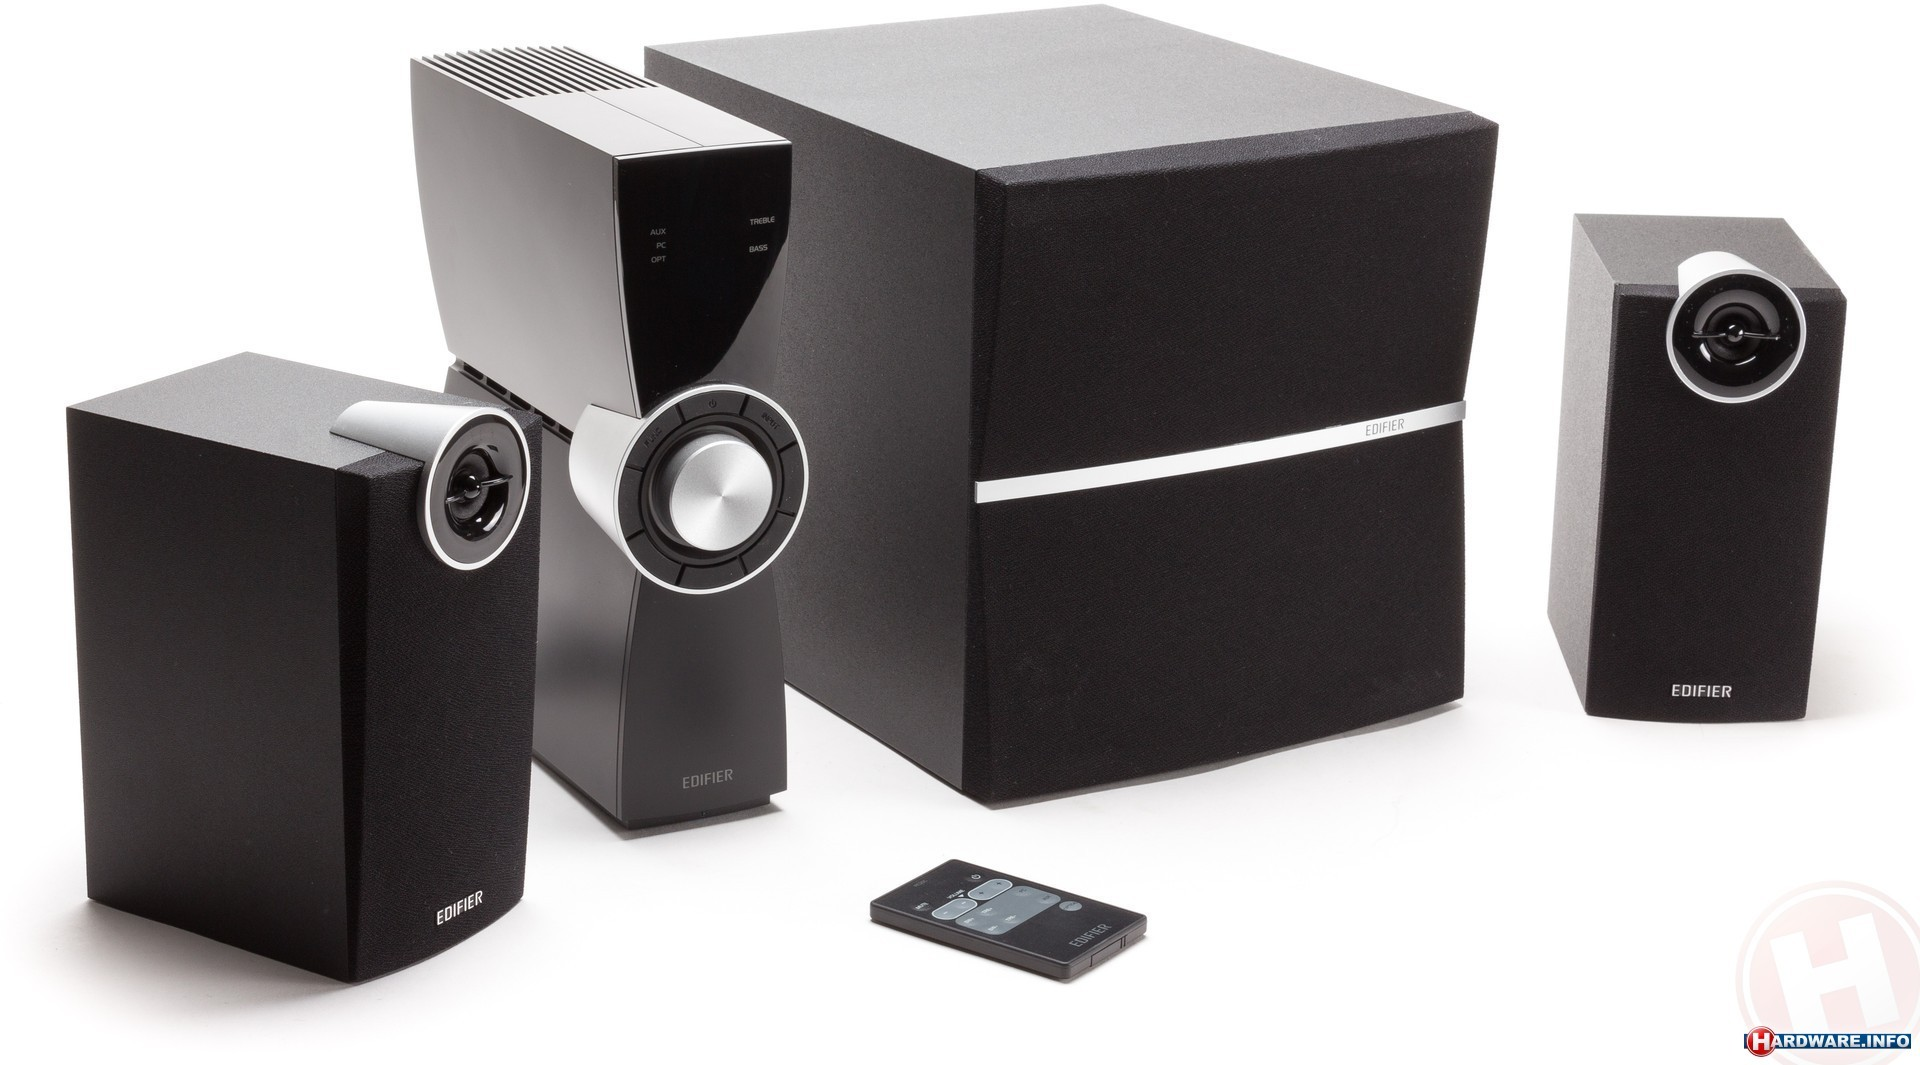 edifier c2xd multimedia speaker edifier c2xd multimedia speaker Edifier C2XD Multimedia Speaker Edifier C2XD Multimedia Speaker